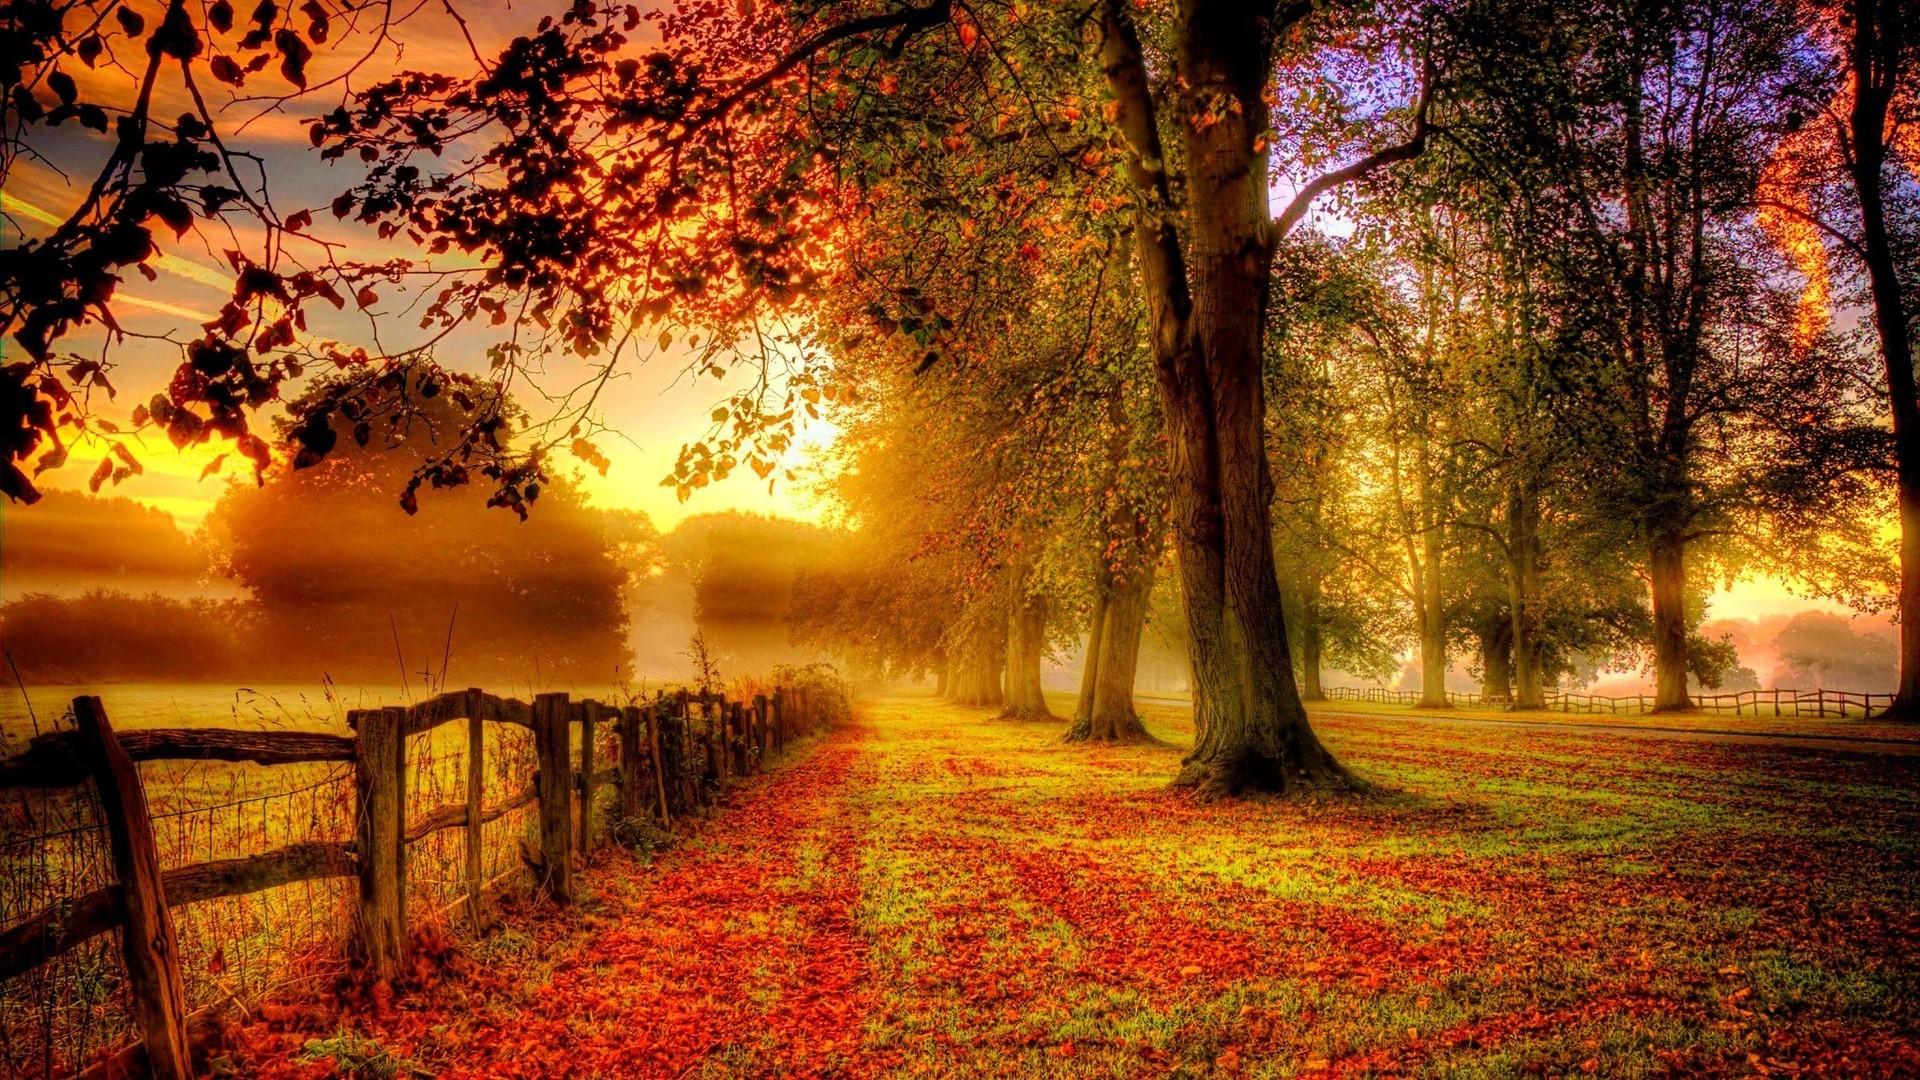 Sunset Trees Autumn I Love Nature Landscape HD POSTER